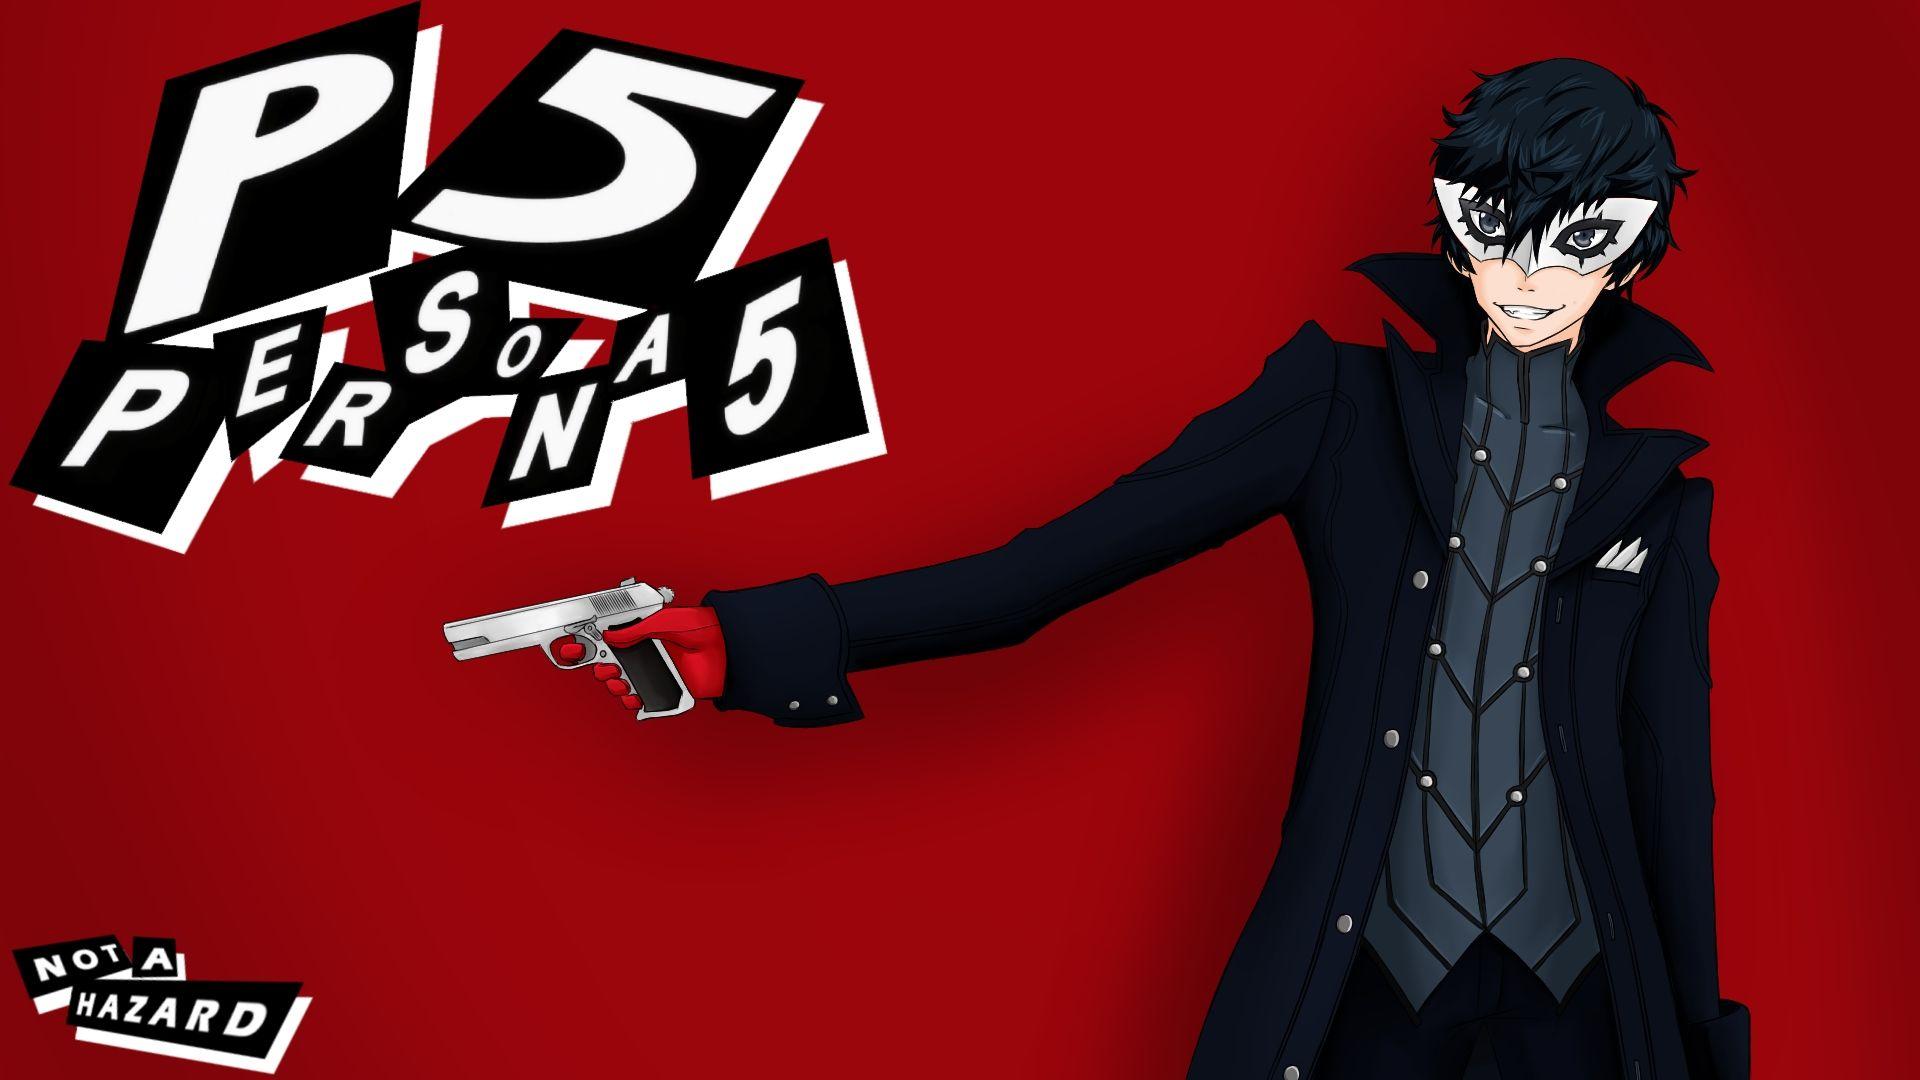 Protagonist Persona 5 1836155 Persona 5 Persona Persona 5 Joker